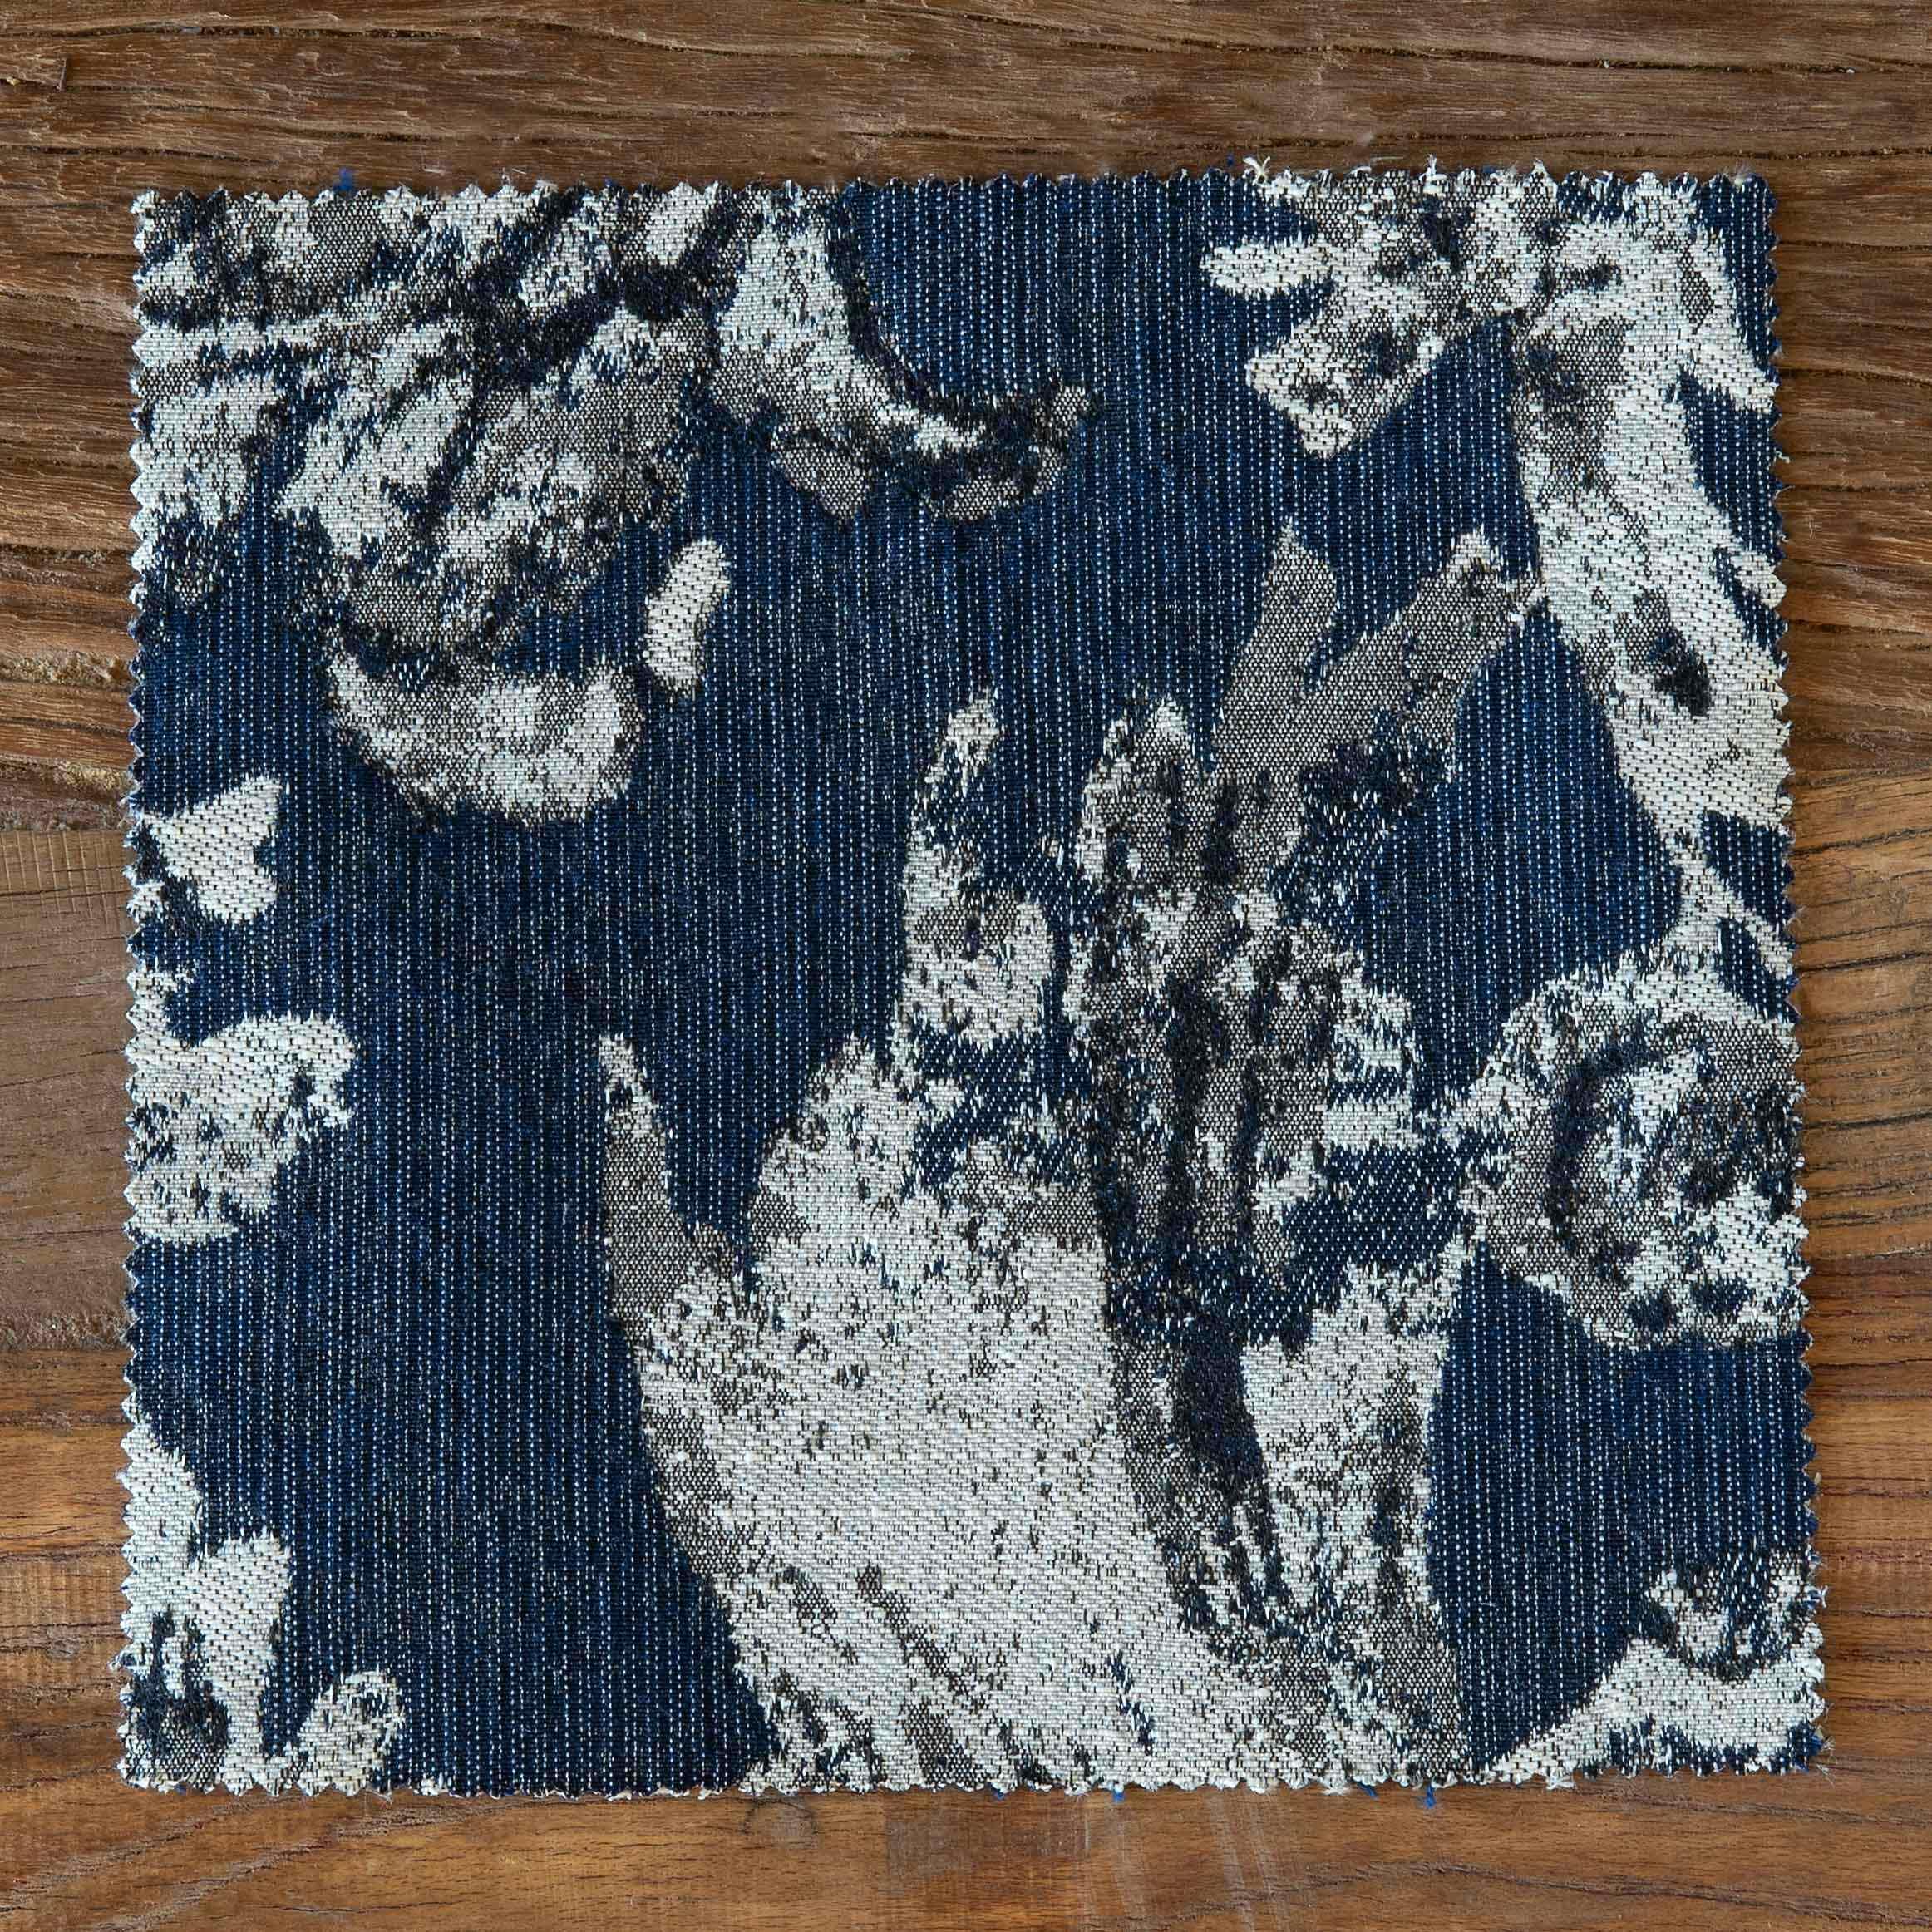 Blue Bird Toile Fabric